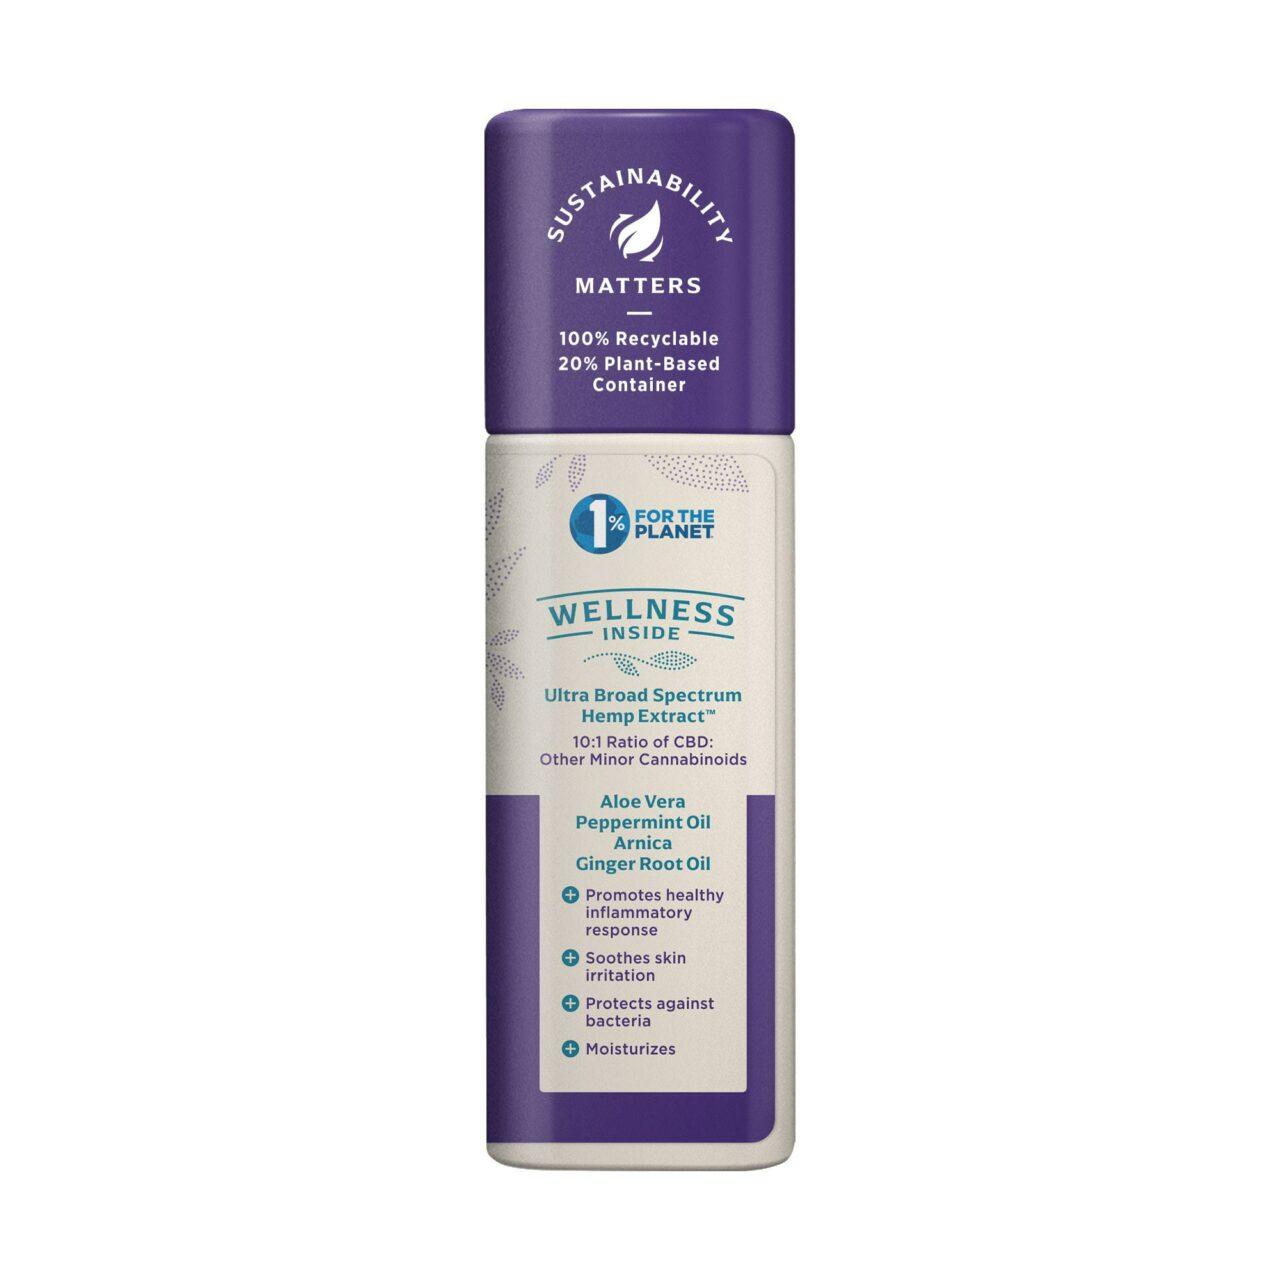 Medterra, Wellness Nature's Relief Daily CBD Cream, Broad Spectrum THC-Free, 1.7oz, 1000mg CBD 2